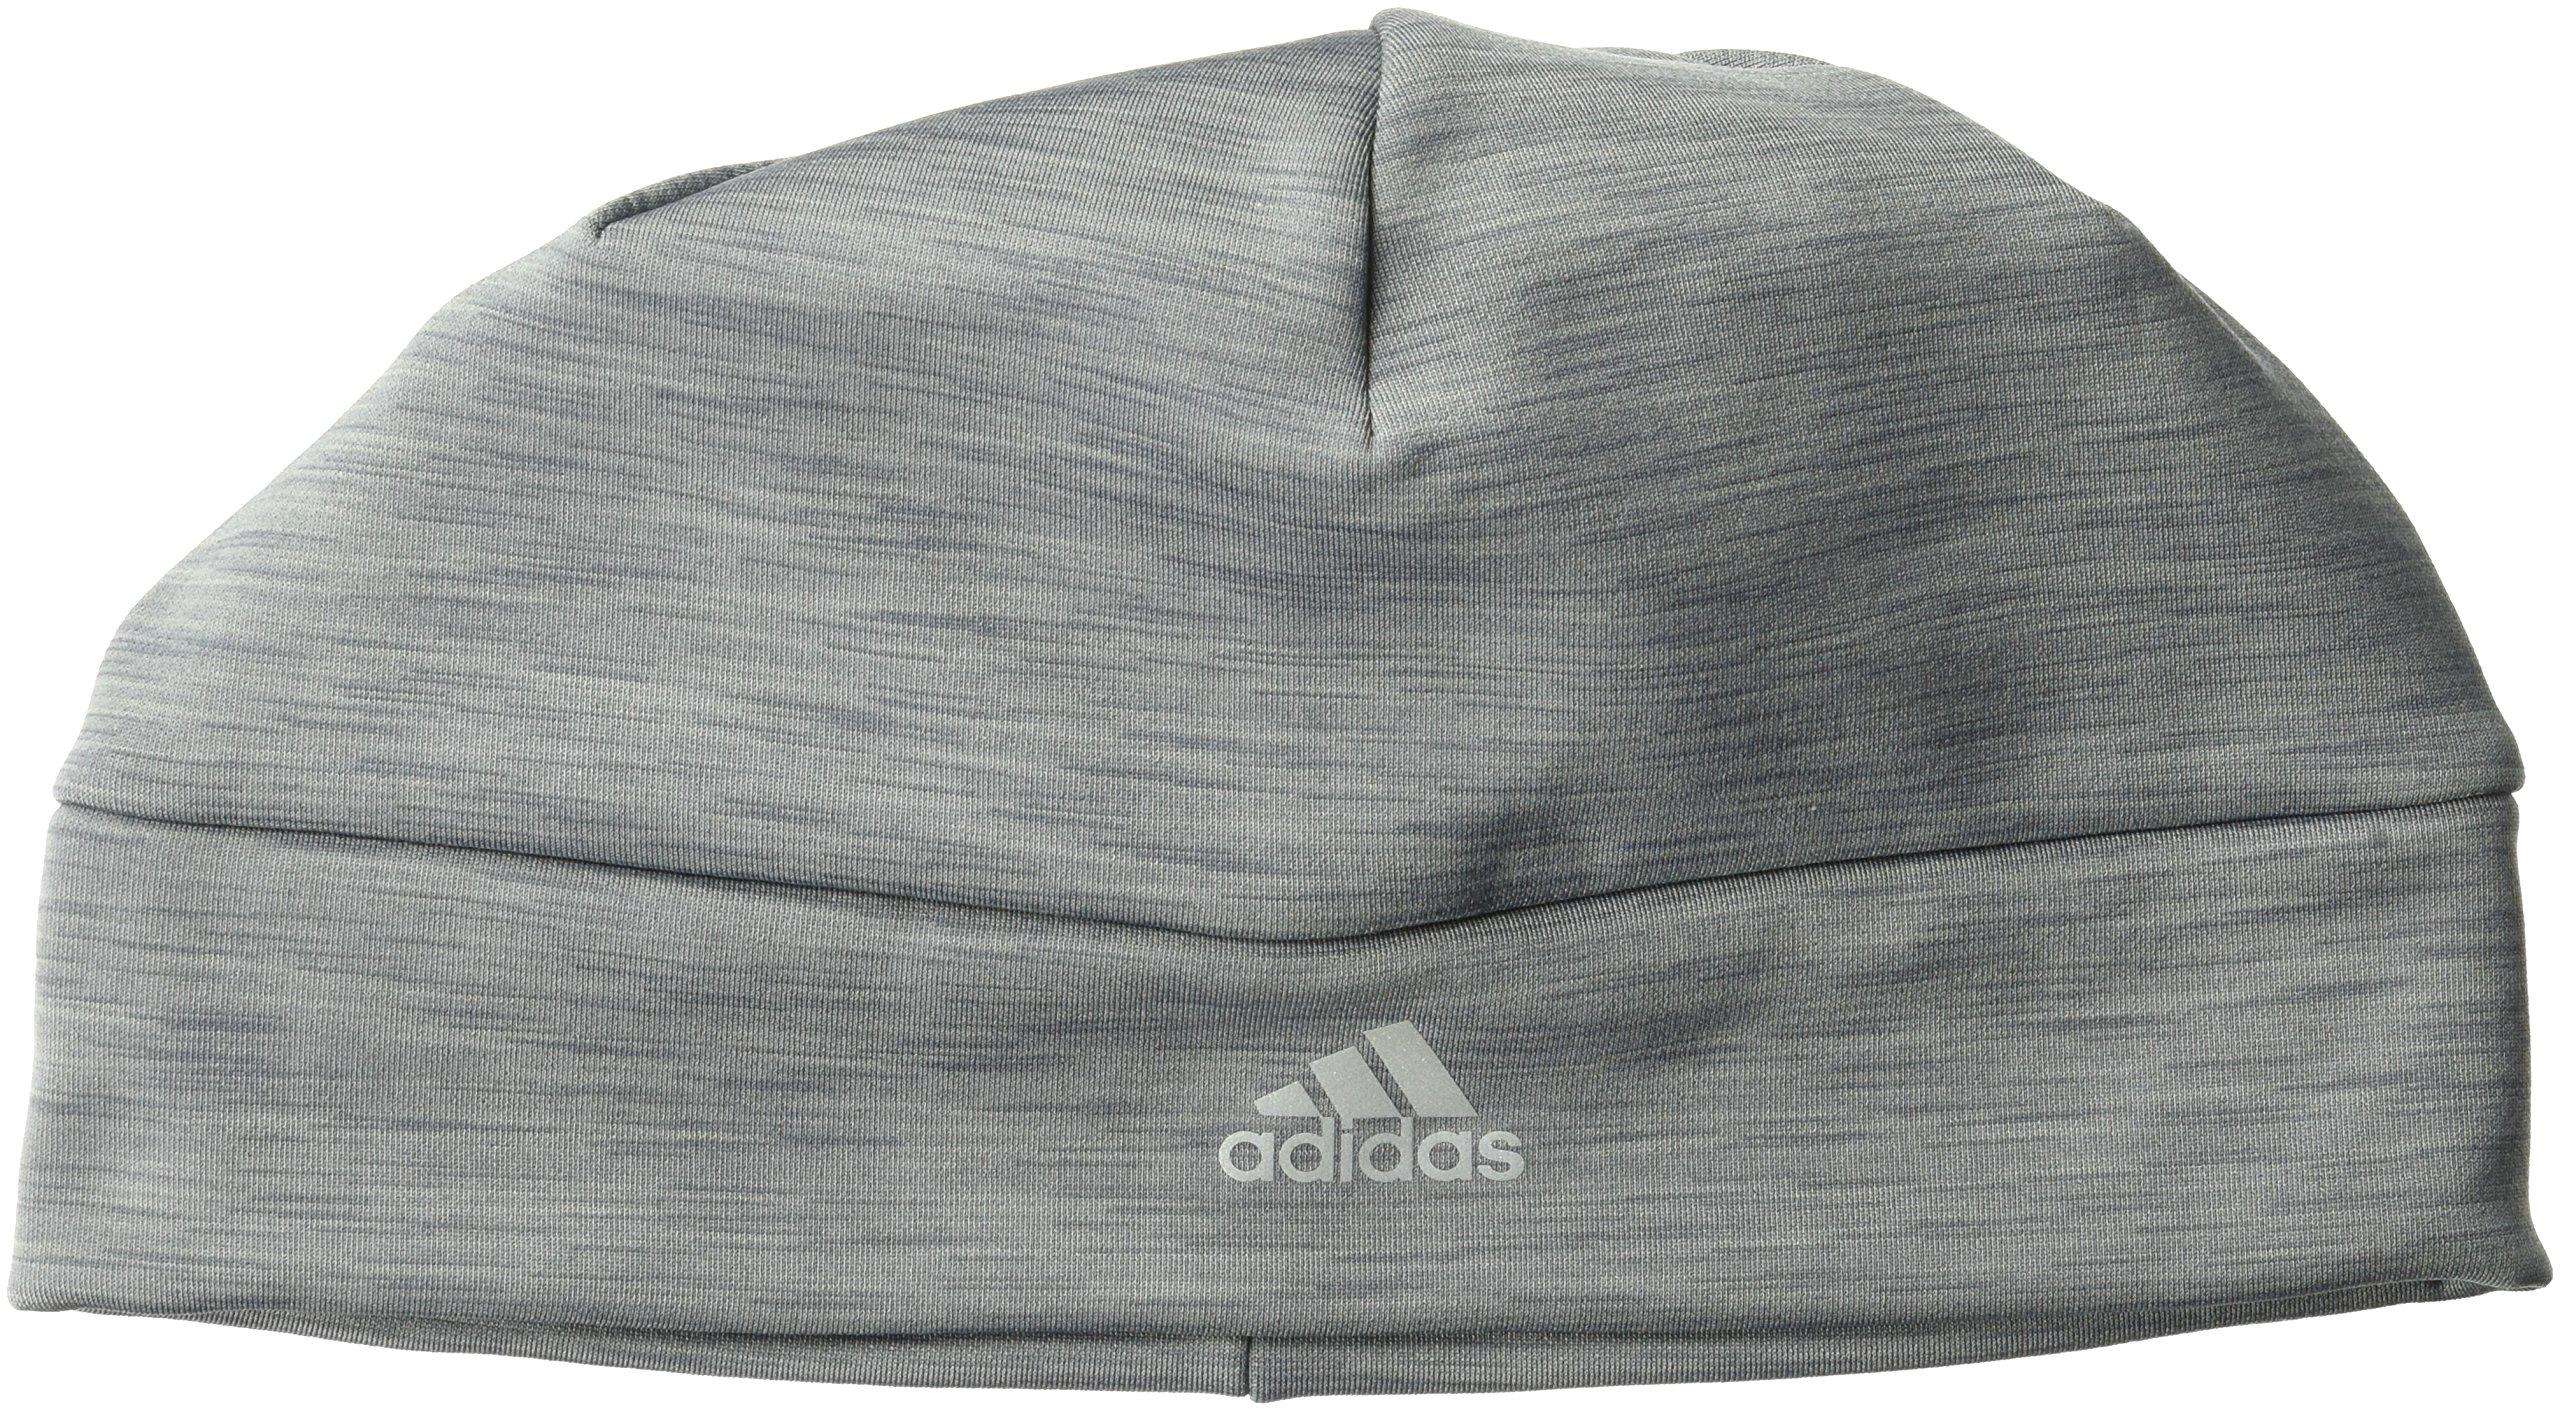 adidas Men's Sharp II Fleece Beanie, Grey, One Size